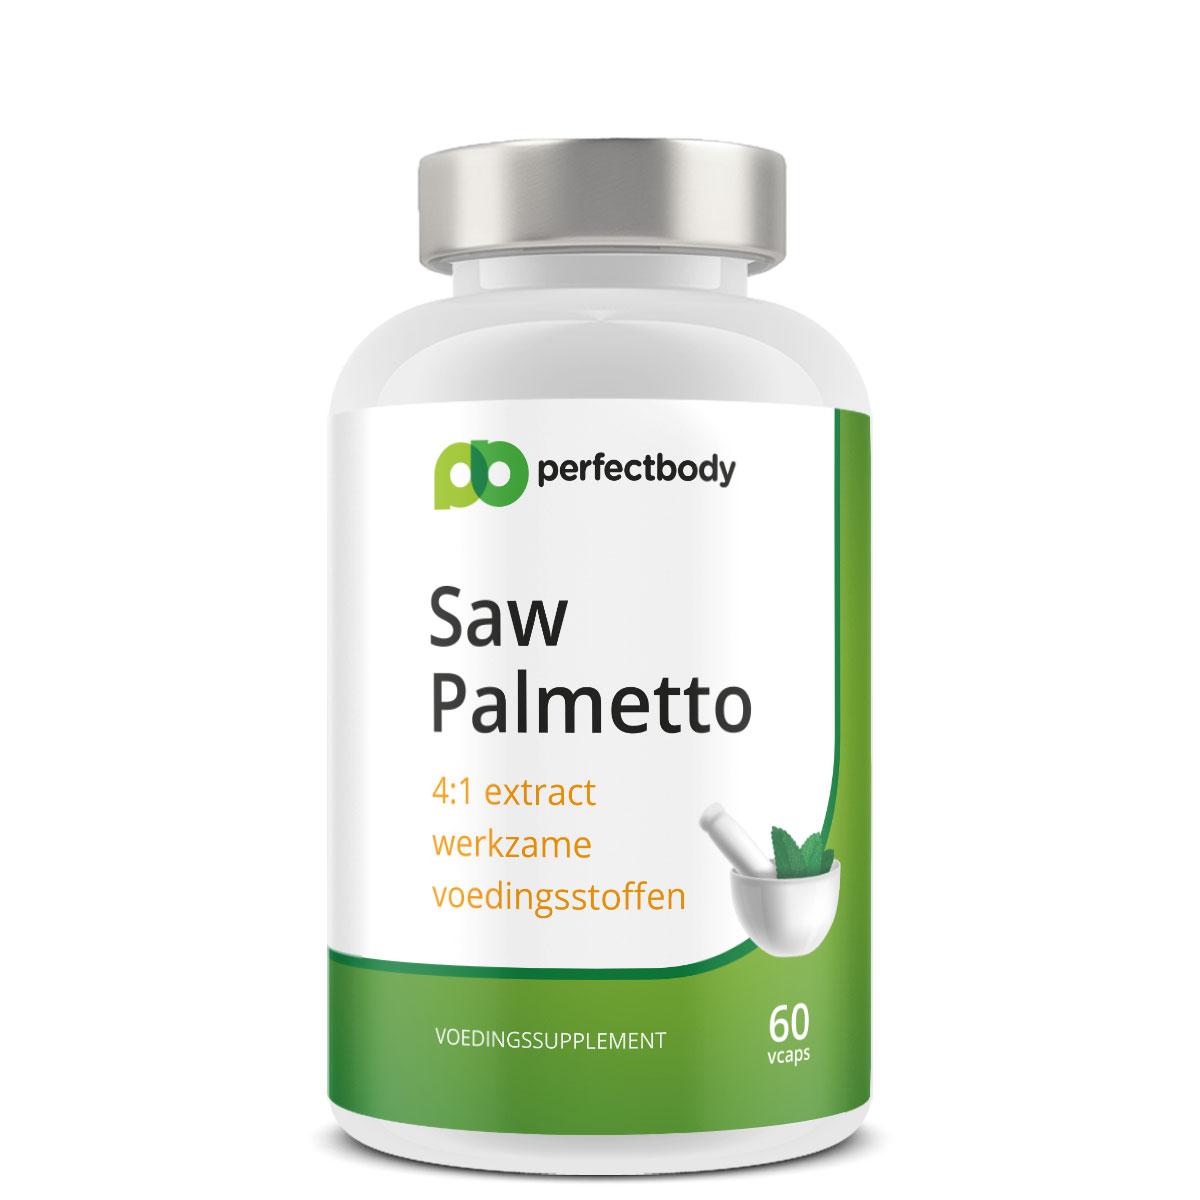 Perfectbody Saw Palmetto (zaagbladpalm) Capsules - 60 Vcaps